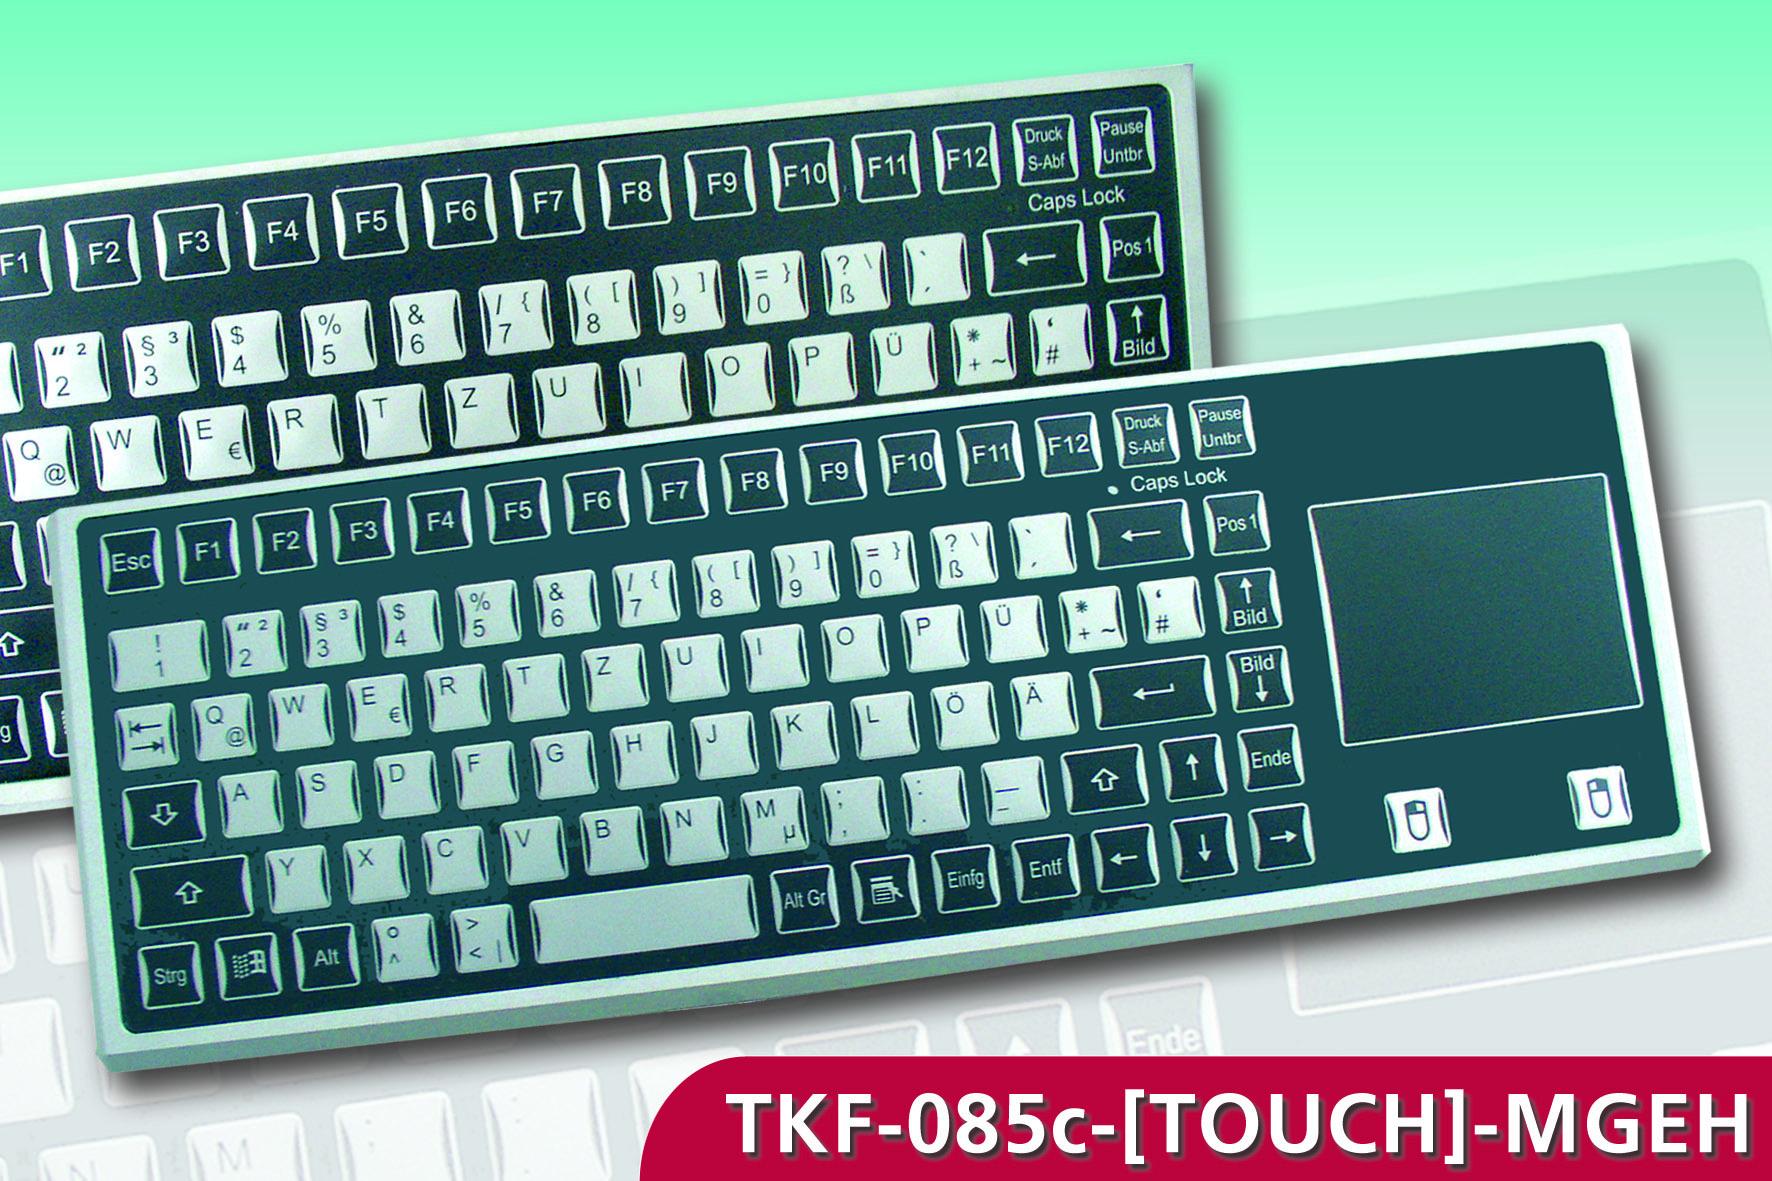 Https Pressemitteilung Mscsoftware Gmbh Msc Castello Keyboard Mouse Usb Bild